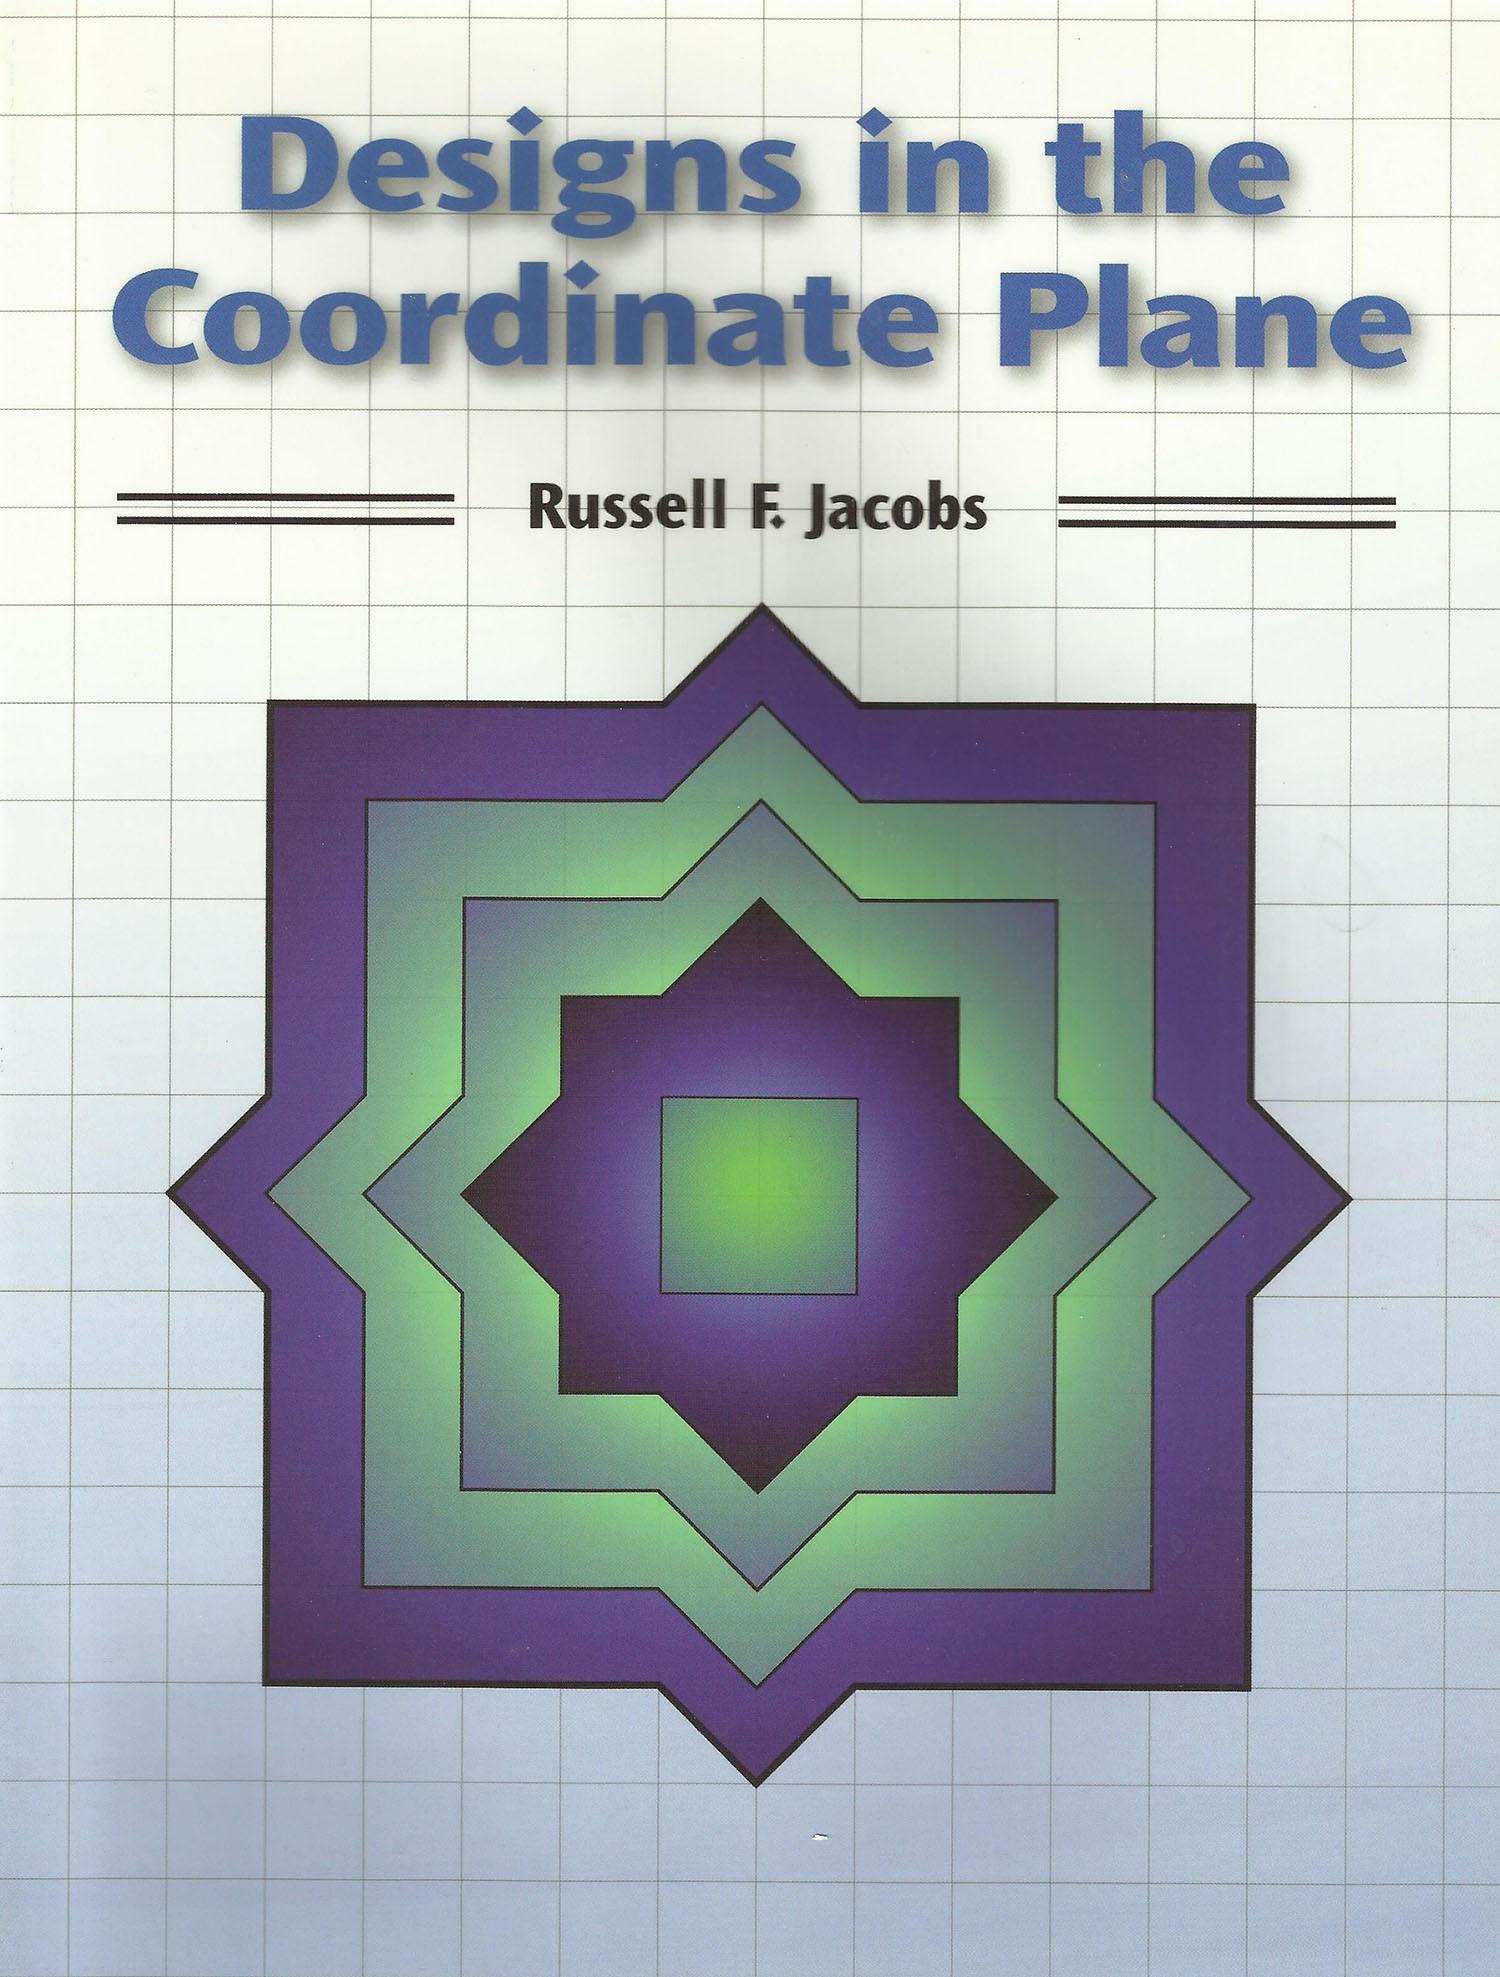 Designs in the Coordinate Plane